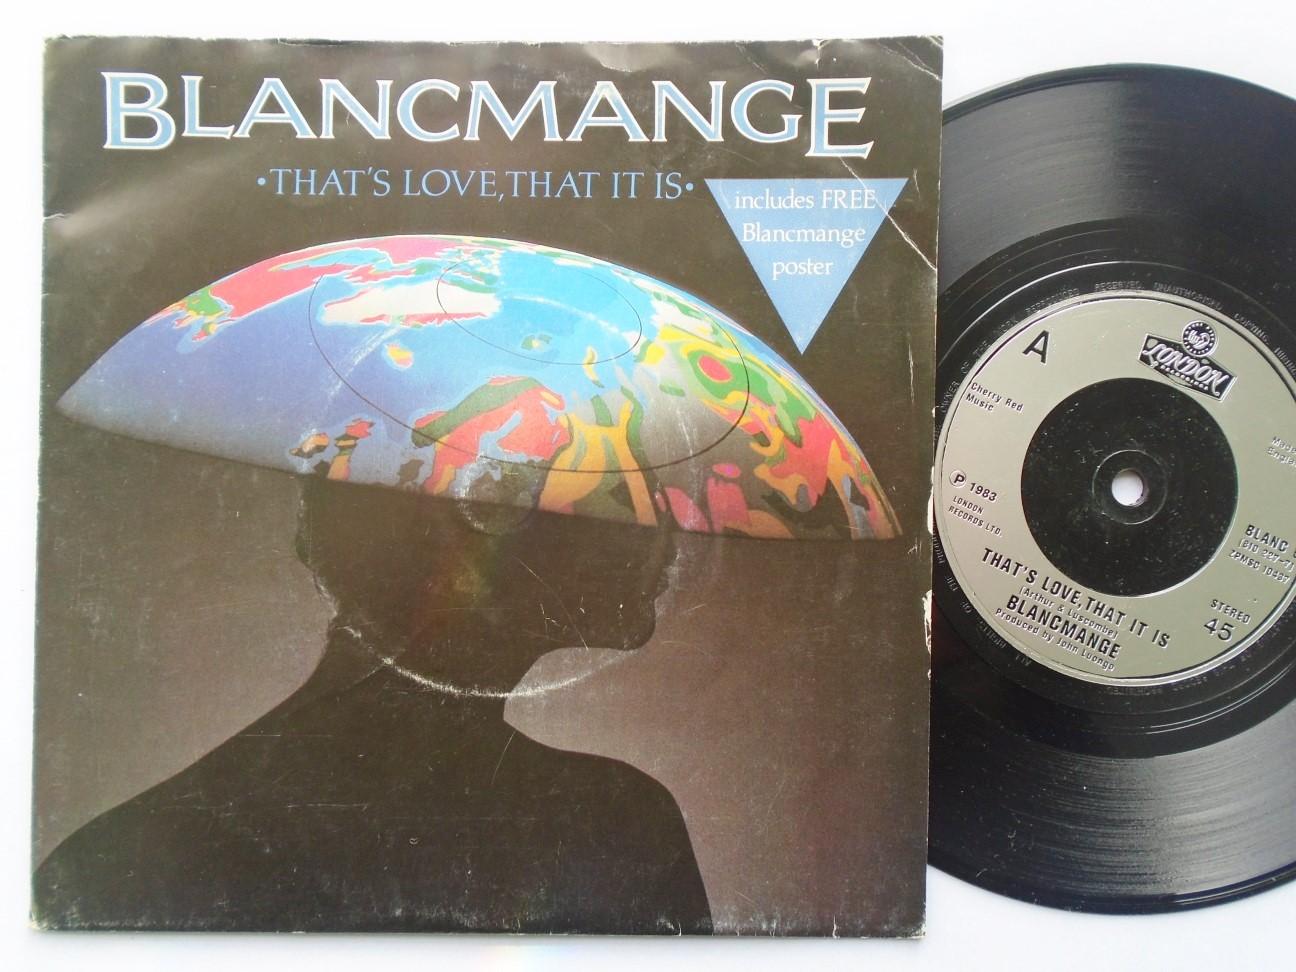 Blancmange - That's Love That It Is/vishnu